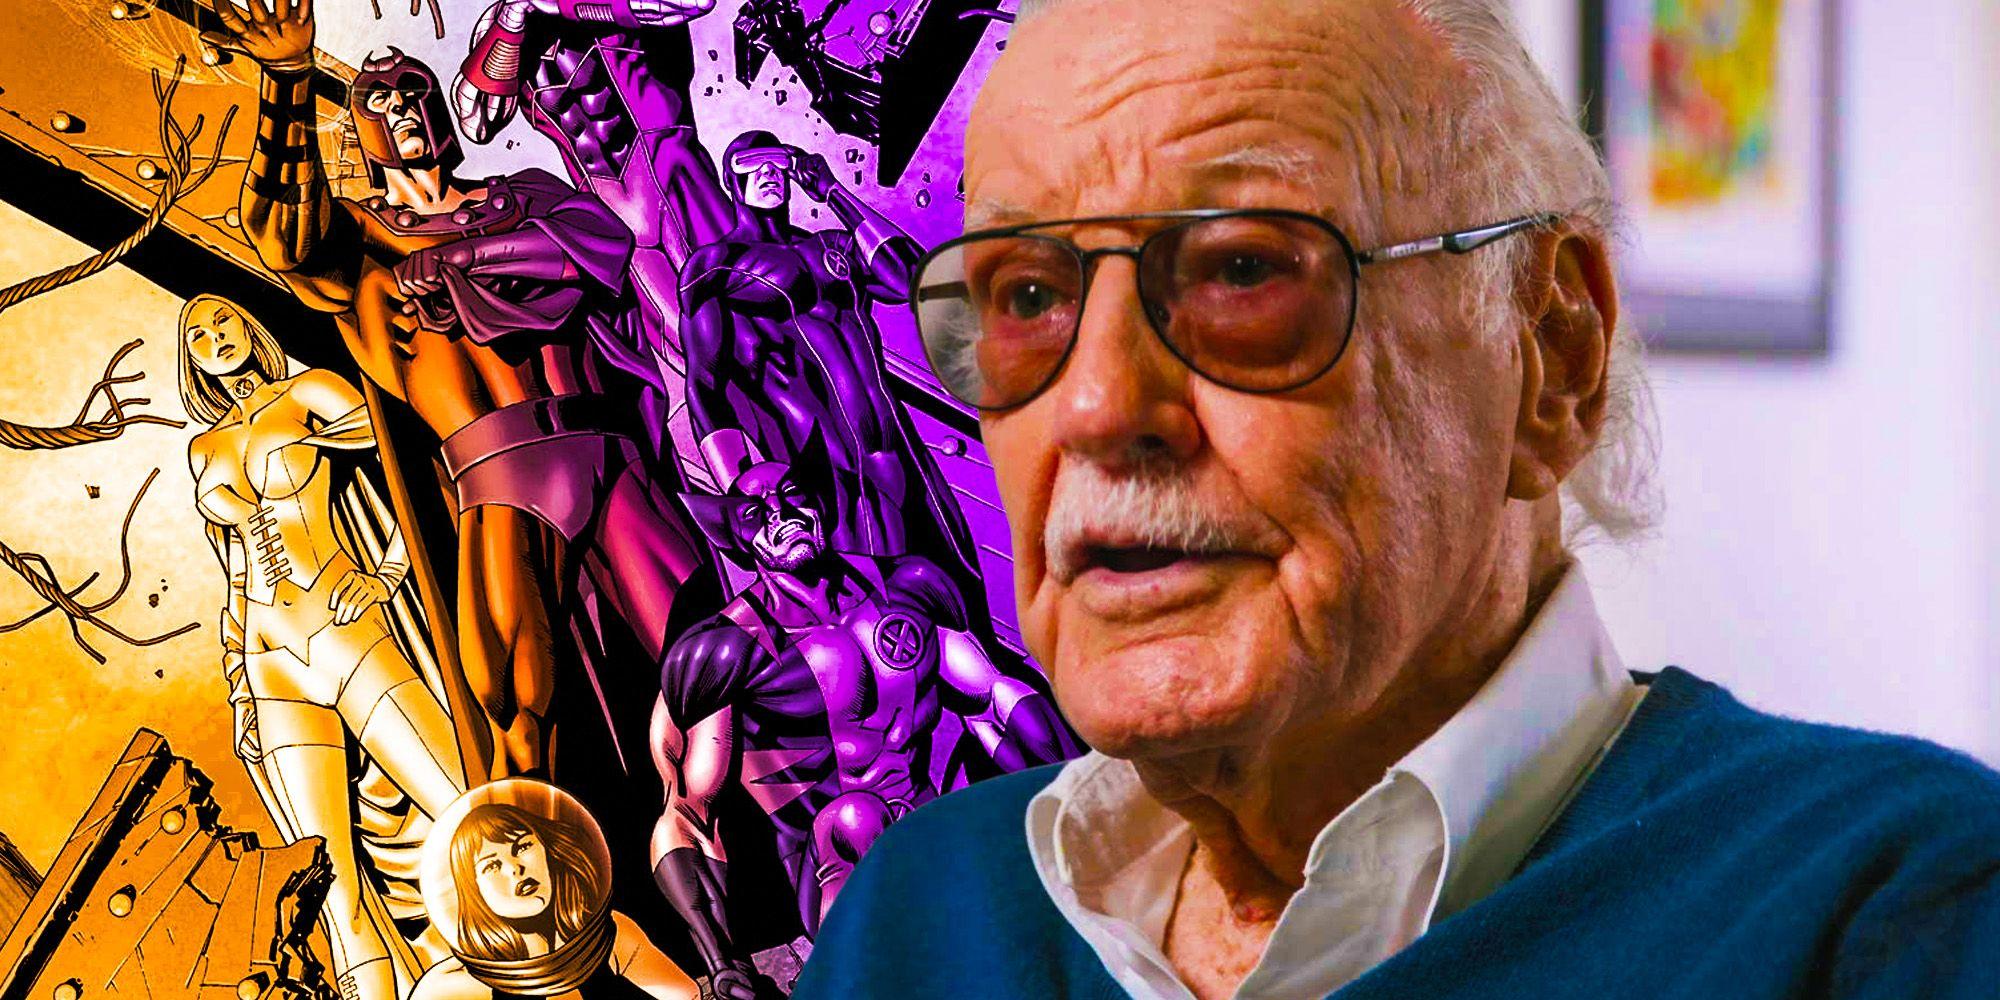 Stan Lee's Forgotten Mutant Story Can Help Retcon X-Men Into MCU Canon